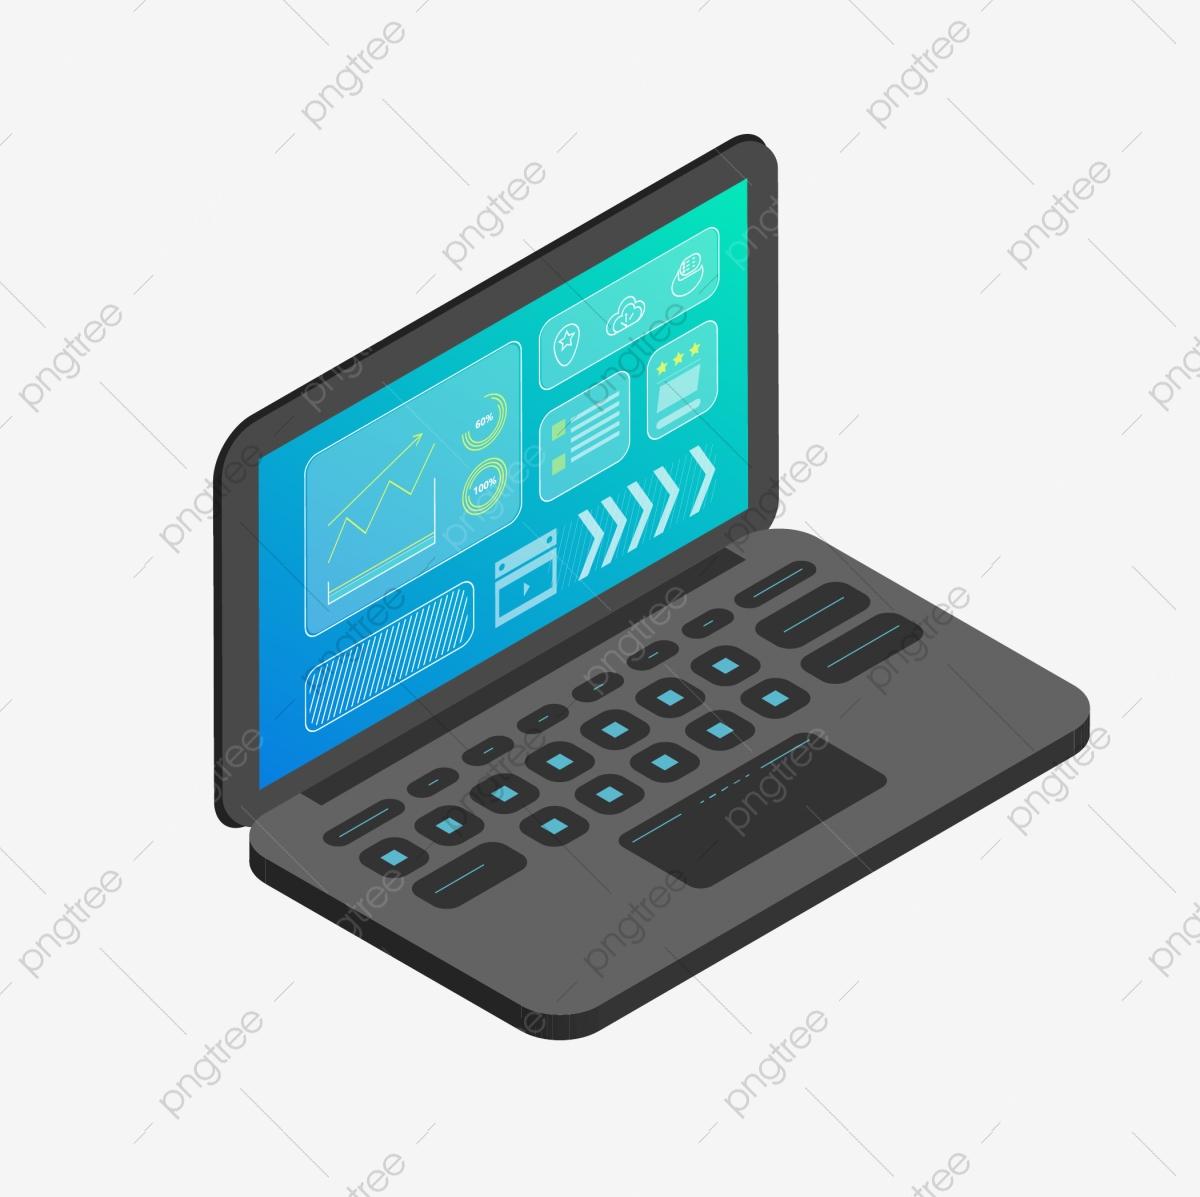 d blue computer. Laptop clipart technology